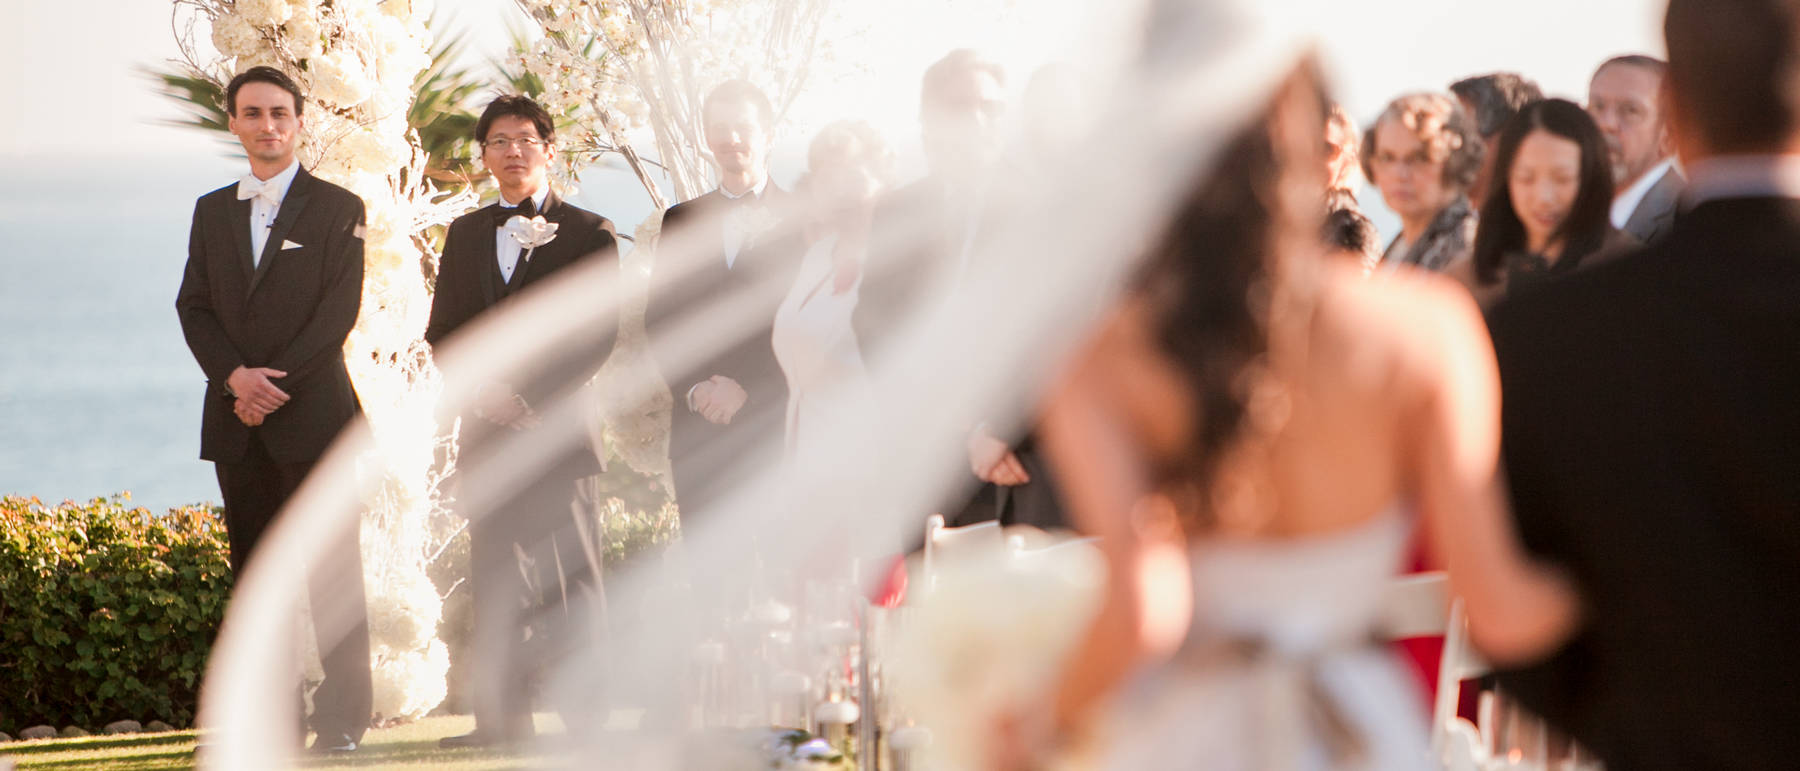 johnandjoseph-wedding-photographer-hz-slider-323